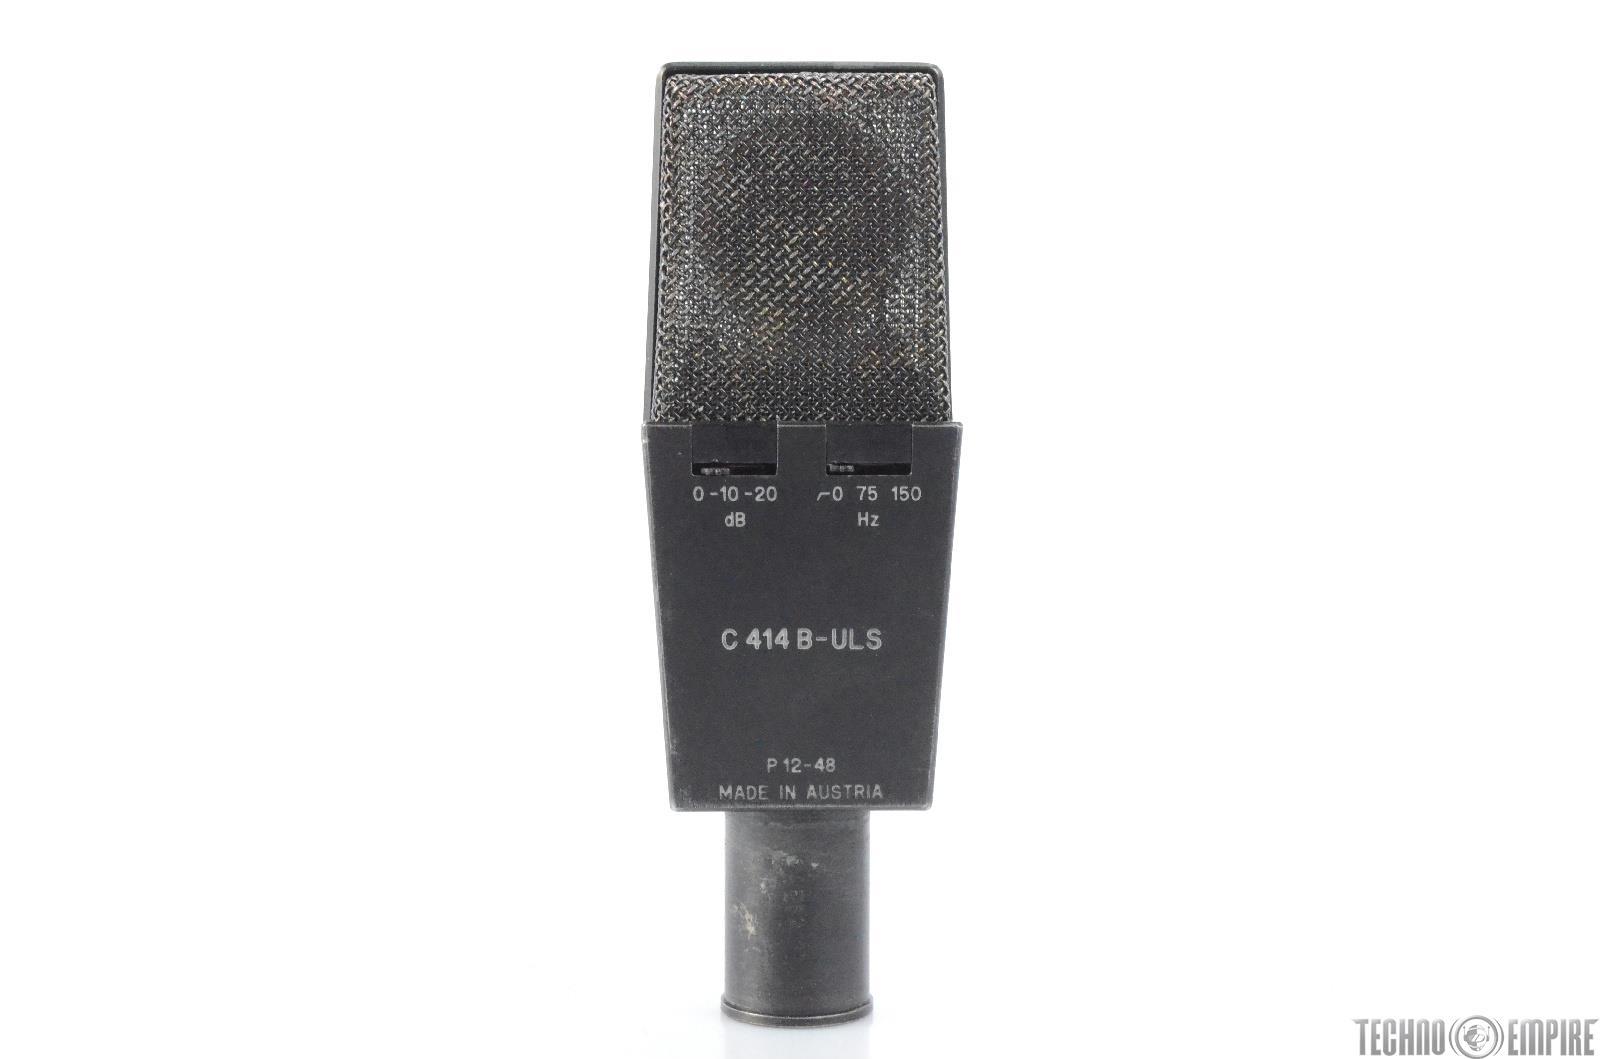 1986 akg c414 b uls multi pattern cardioid microphone 28483 ebay. Black Bedroom Furniture Sets. Home Design Ideas